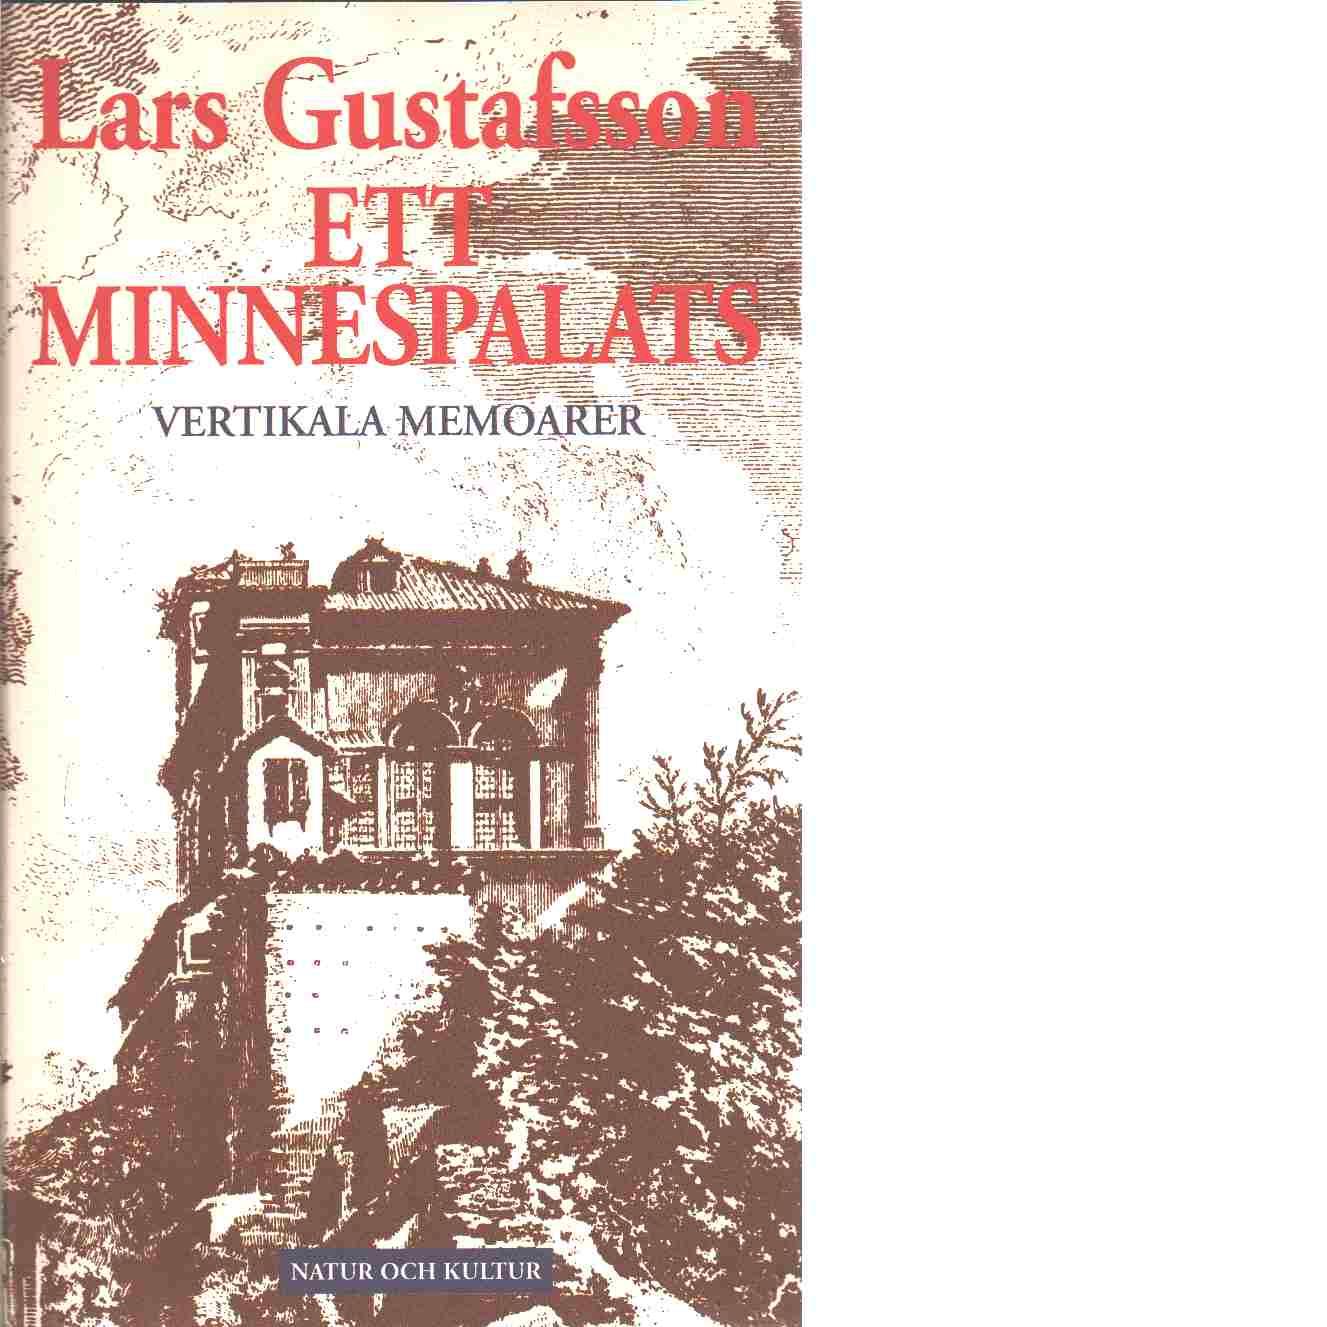 Ett minnespalats : vertikala memoarer - Gustafsson, Lars